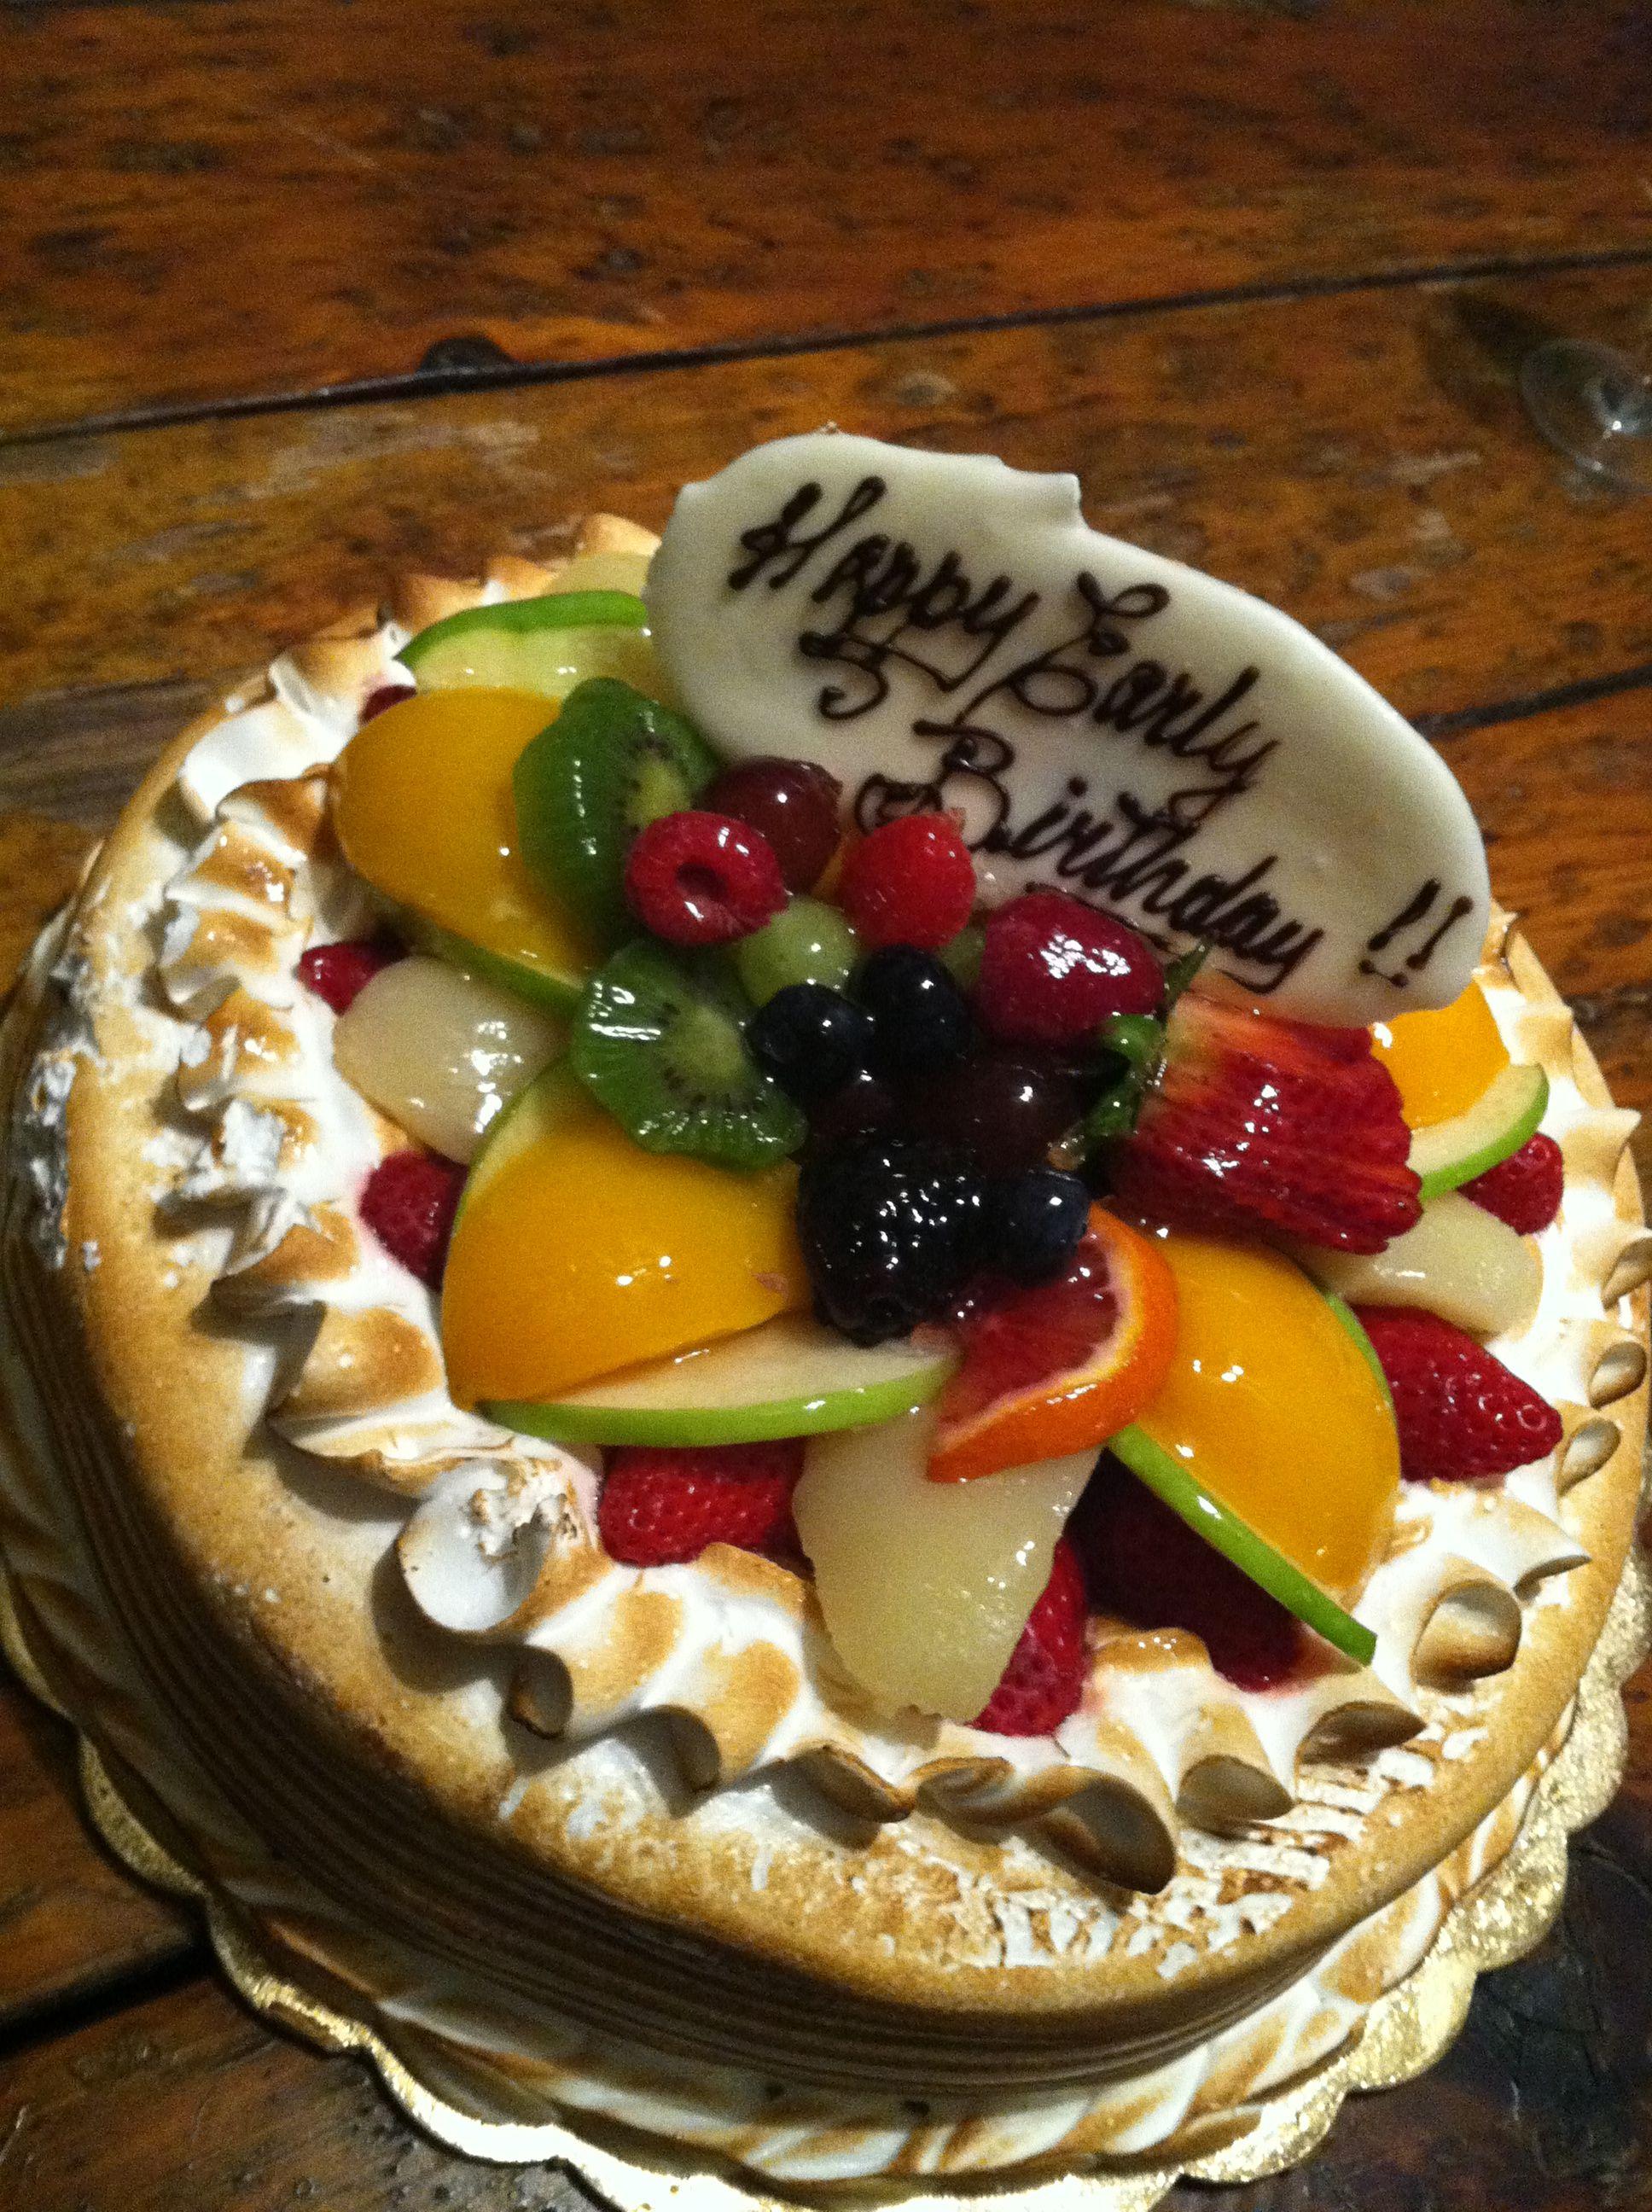 Birthday cake from parissa